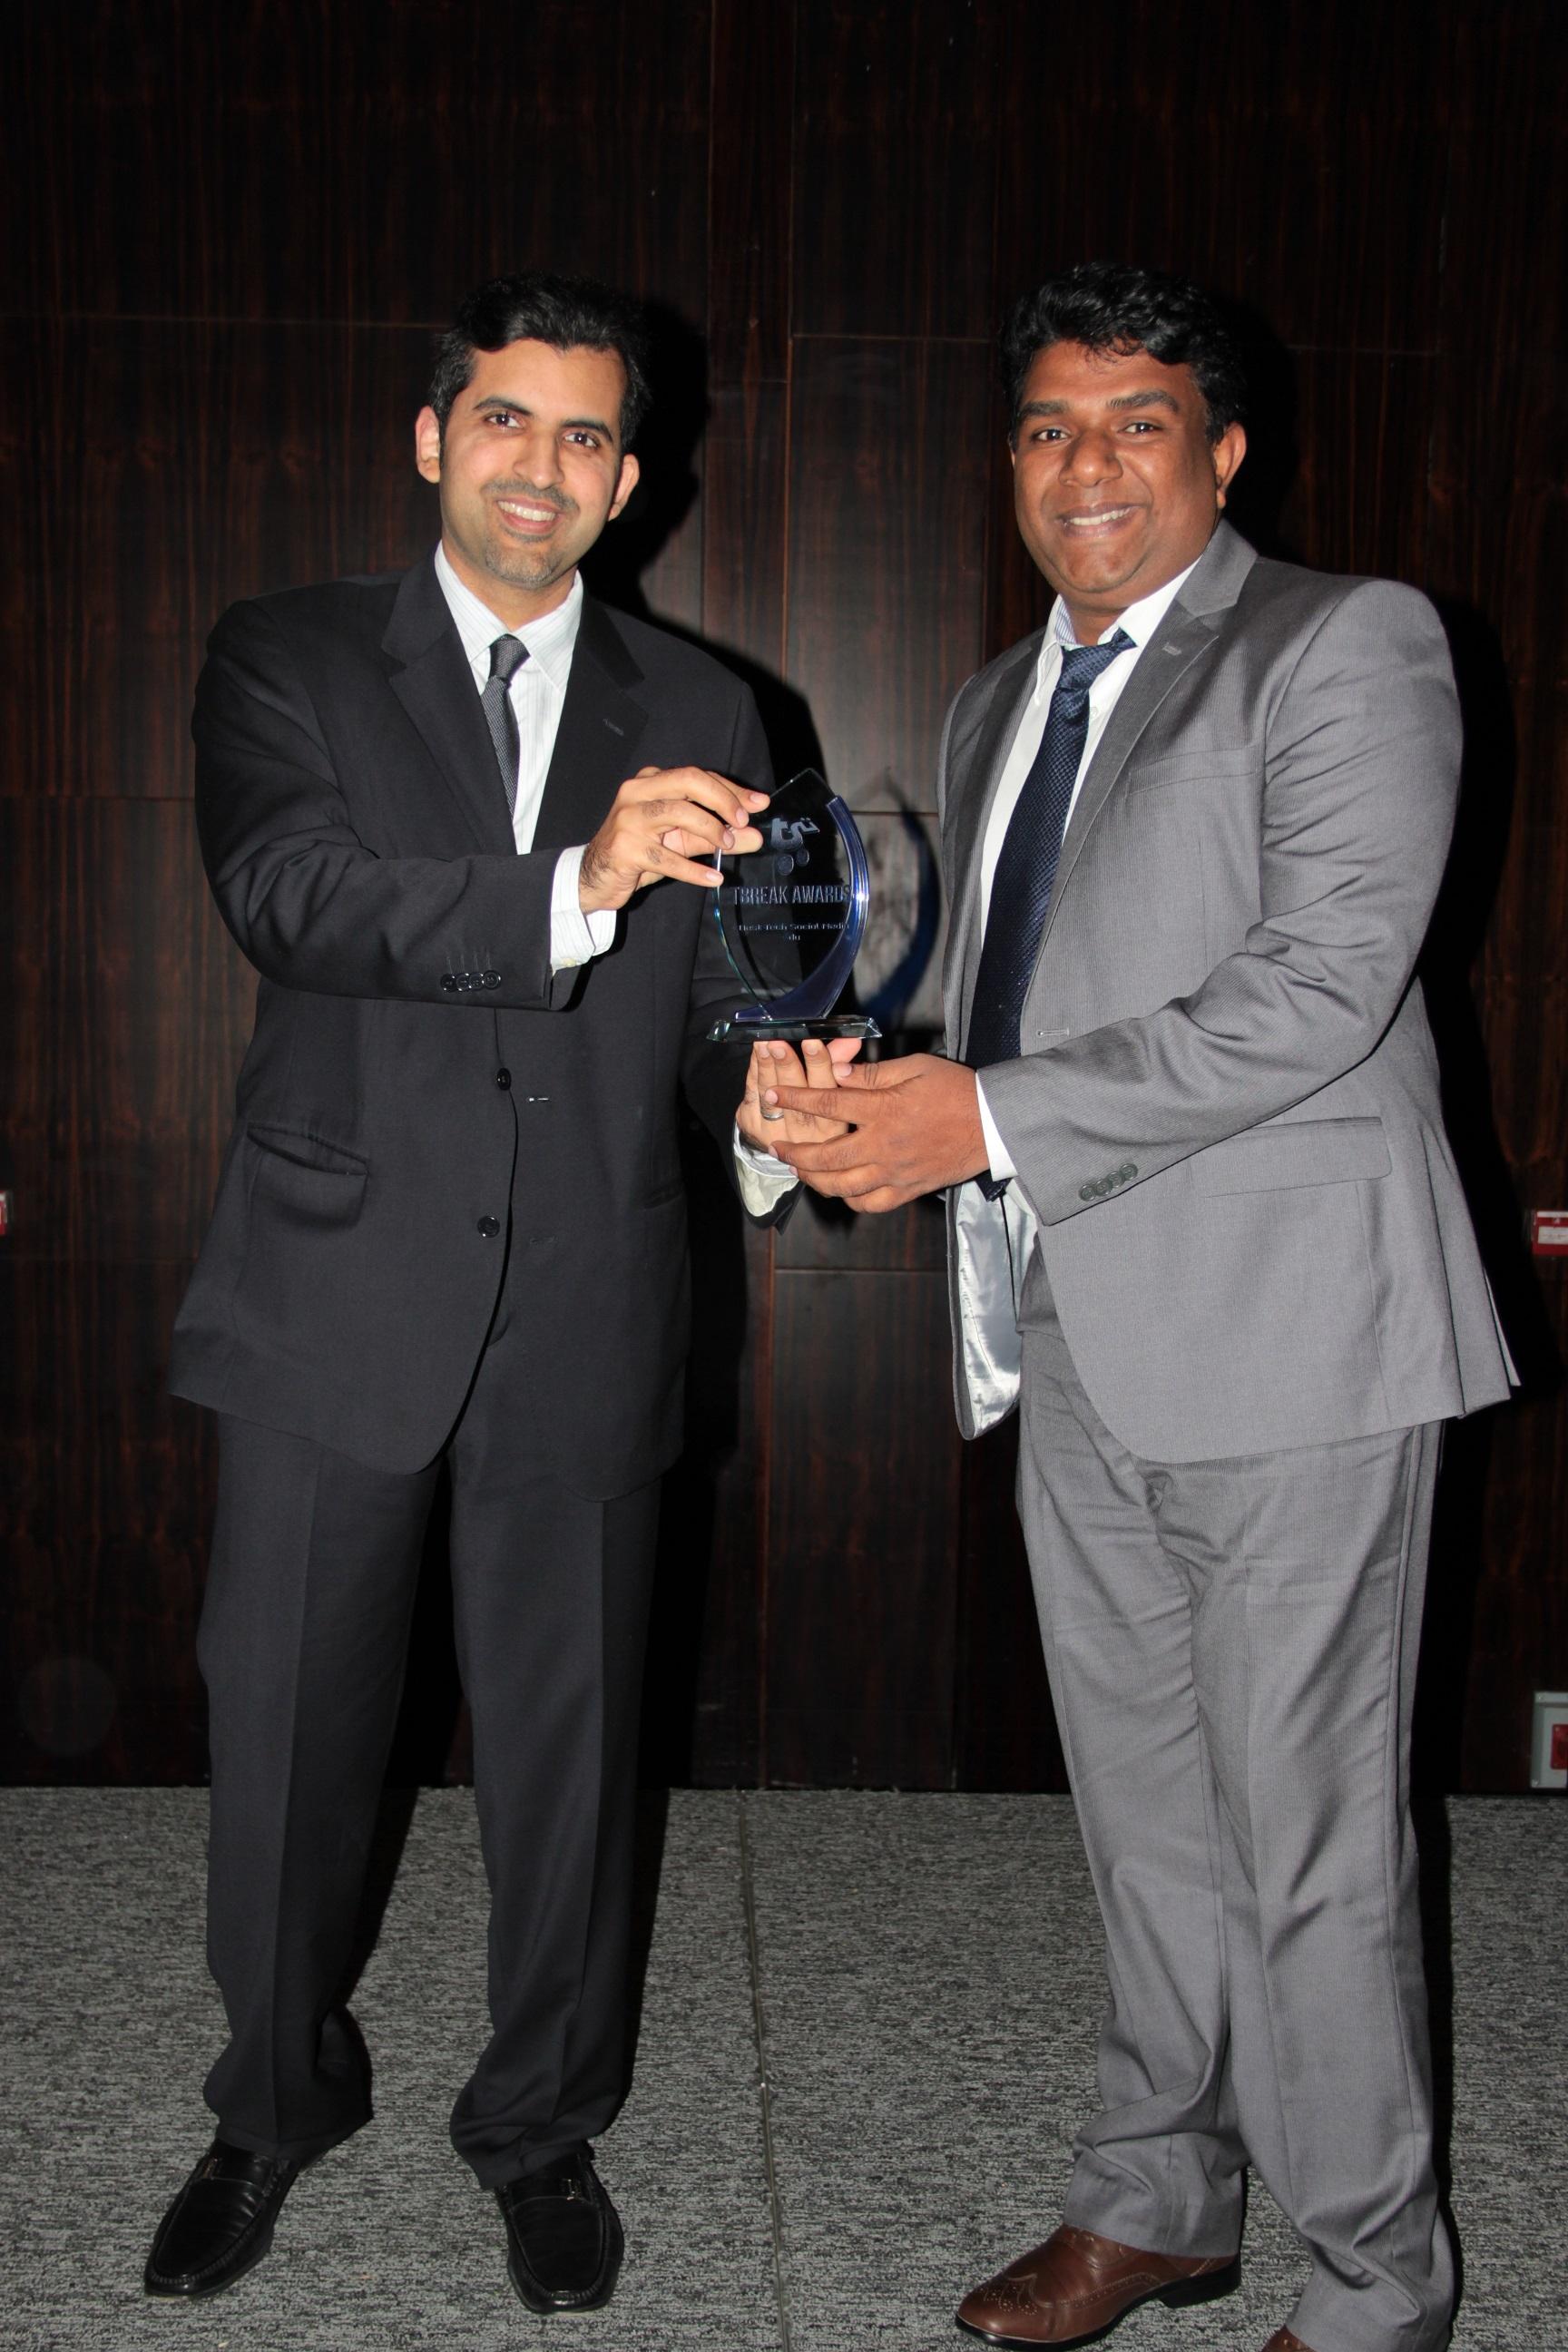 du-receives-best-tech-social-media-award-from-tbreak